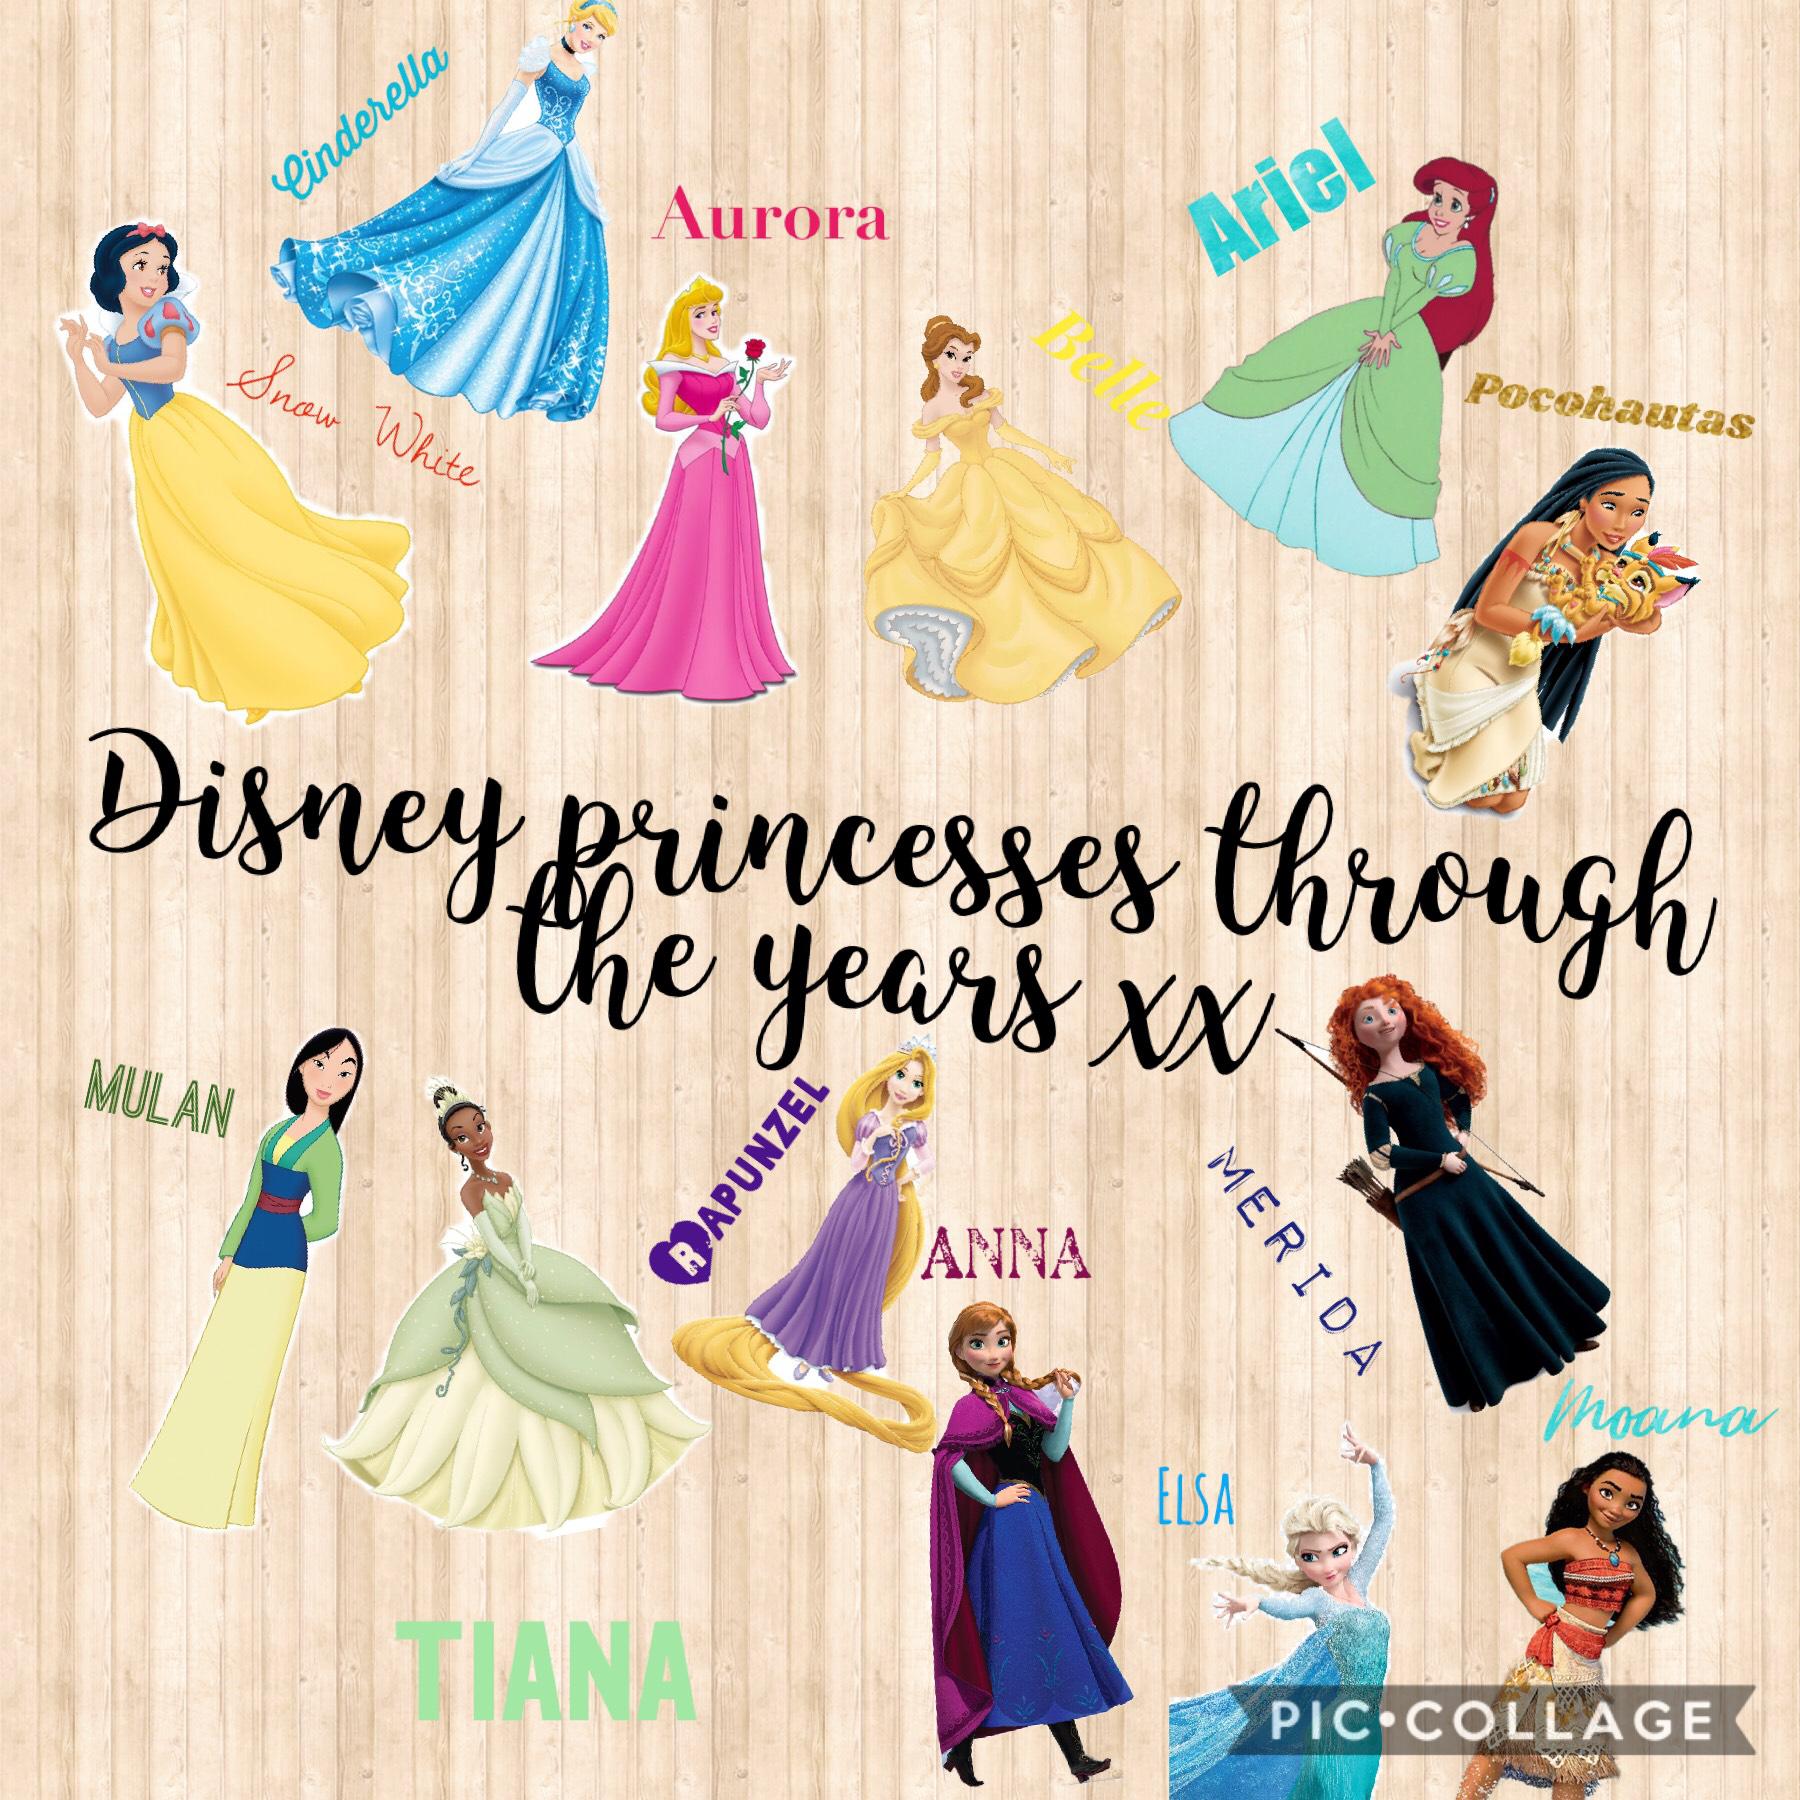 Disney princesses through the years